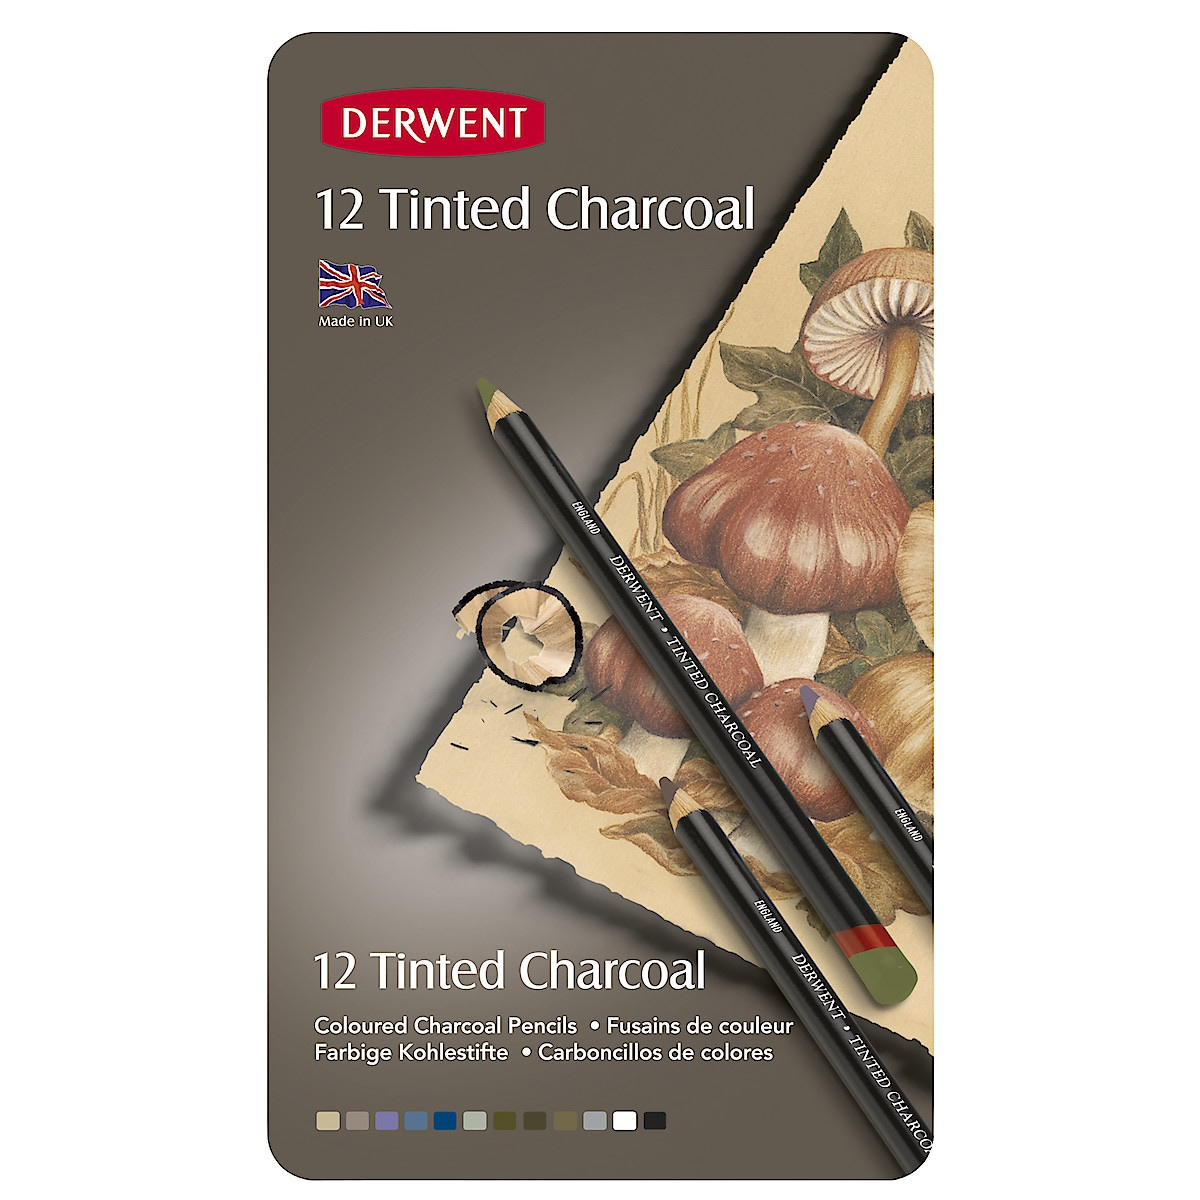 Derwent Tinted Charcoal kullblyanter